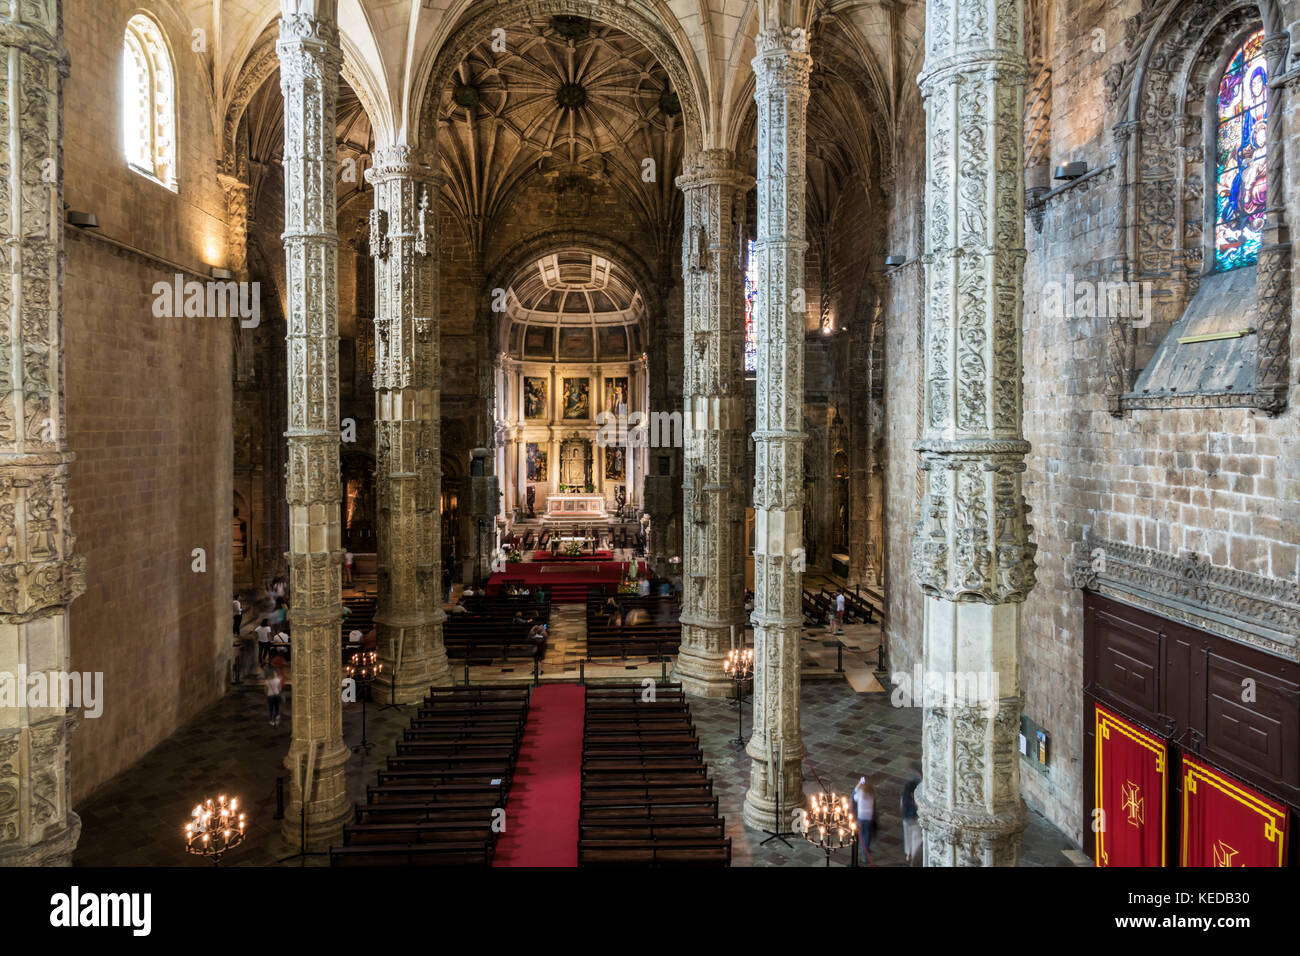 Lisbon Portugal Belem Mosteiro dos Jeronimos Jeronimos Monastery Gothic Manueline architecture nave chancel altar - Stock Image